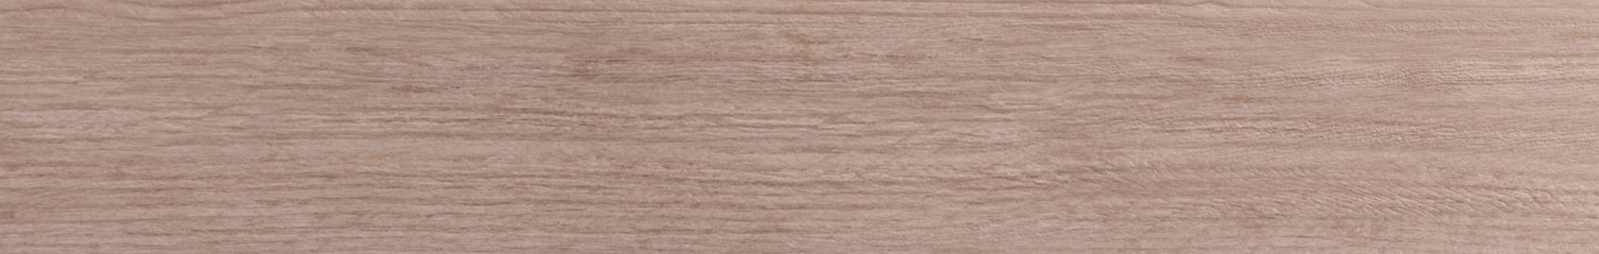 Напольная плитка Venis Hampton +14160 Beige напольная плитка tagina travertini fondo rett nocechiaro 60x120